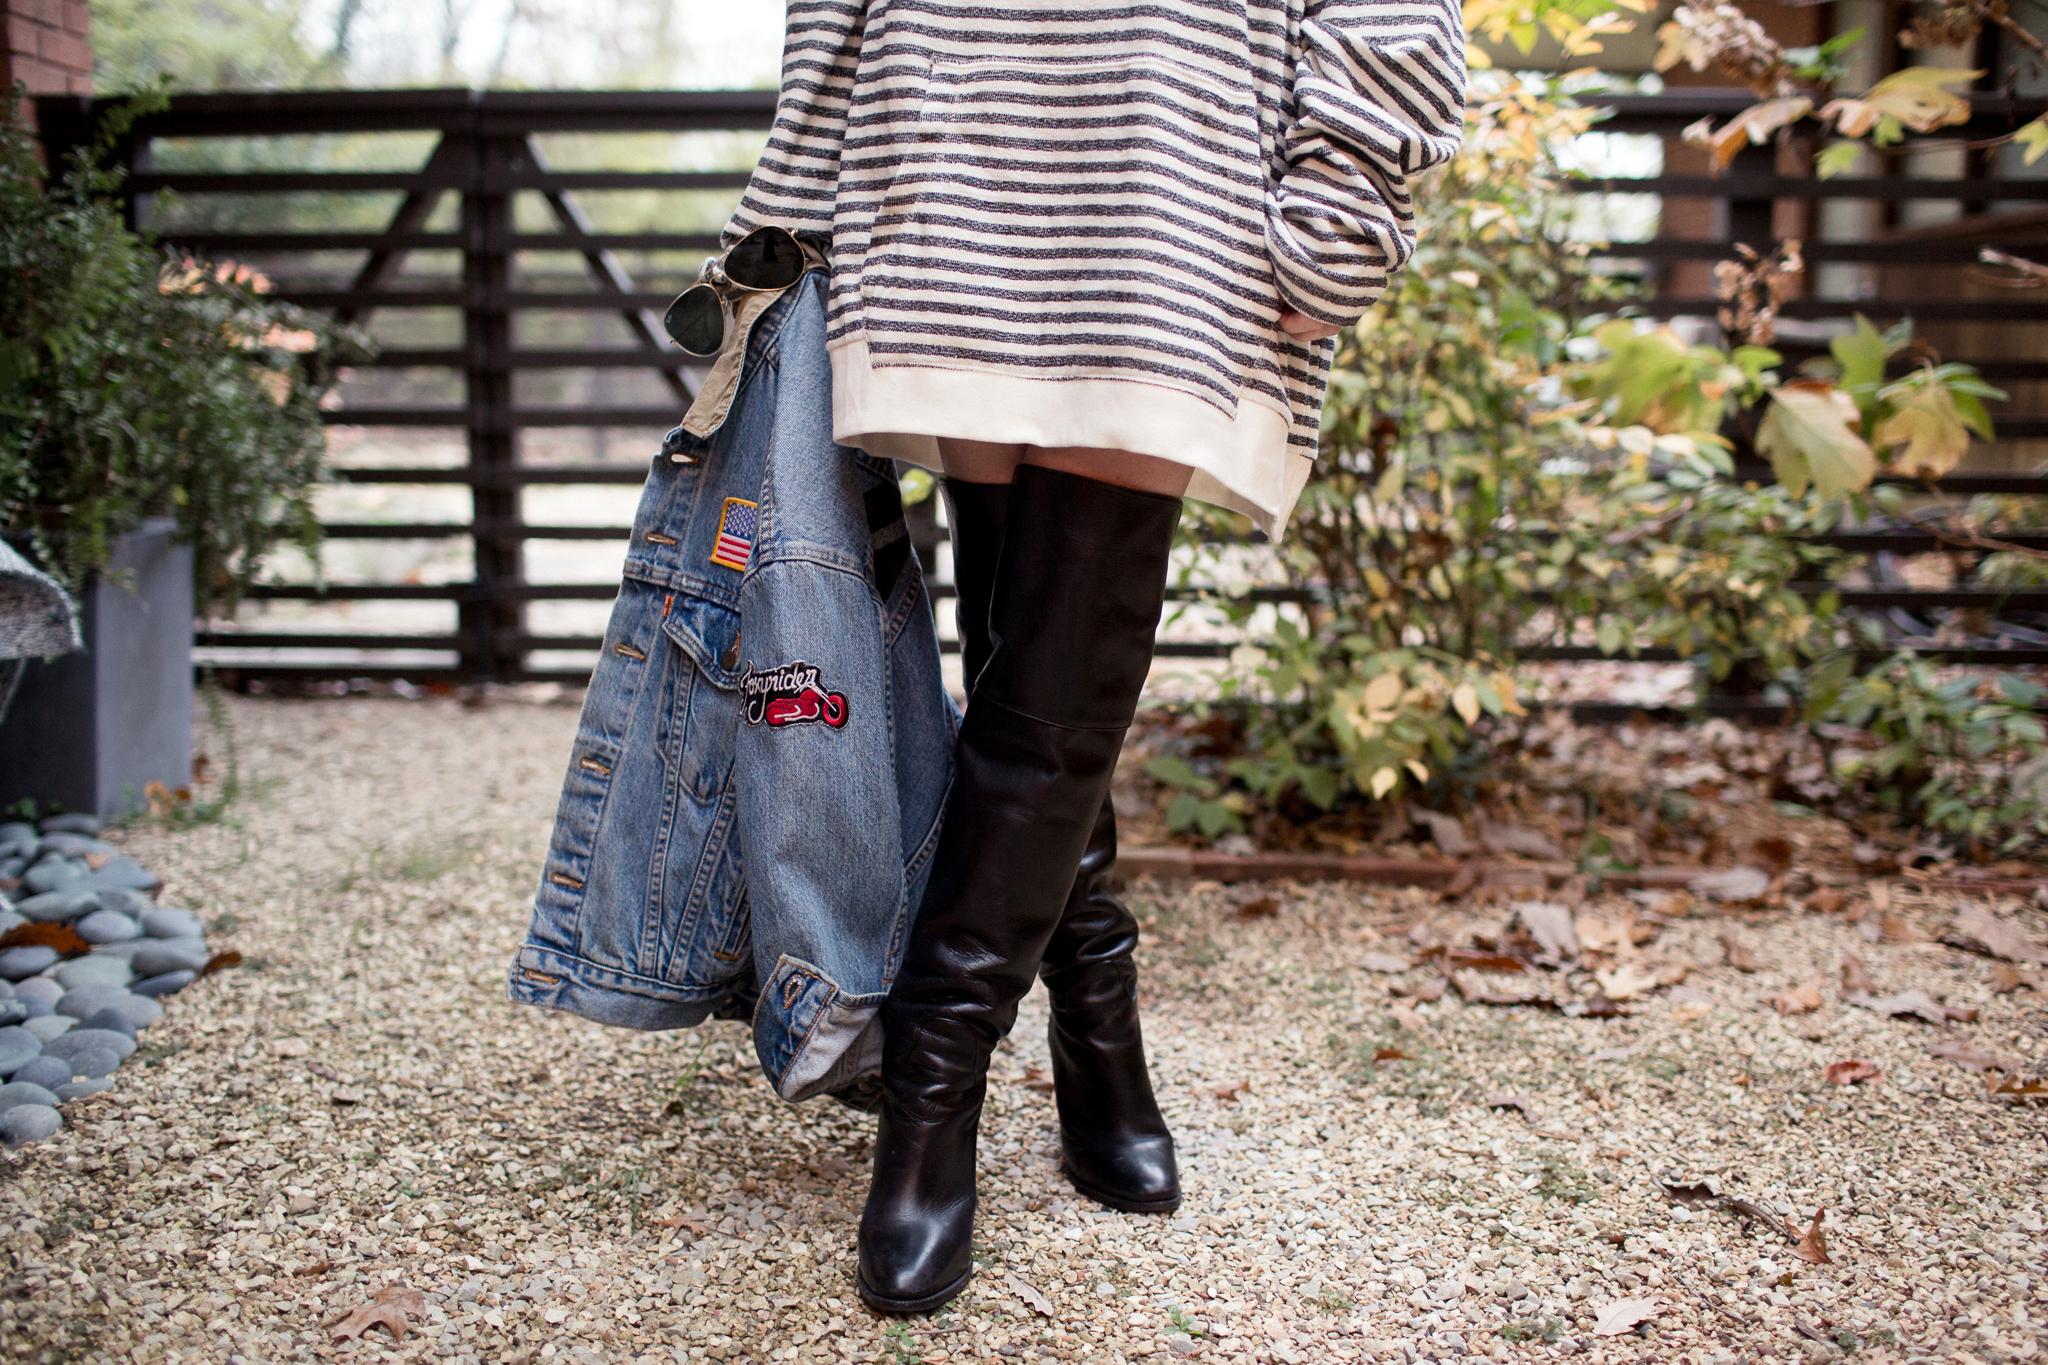 Eldridge Edit-Anna_Cottrell_Fashion_Blogger_Winter_2017_Jean_Denim_Jacket_Patches_Striped_Oversized_Hoodie_Ralph_Lauren_Black_Over_the_Knee_OTK_Boots_MGB_Photo_6.jpg